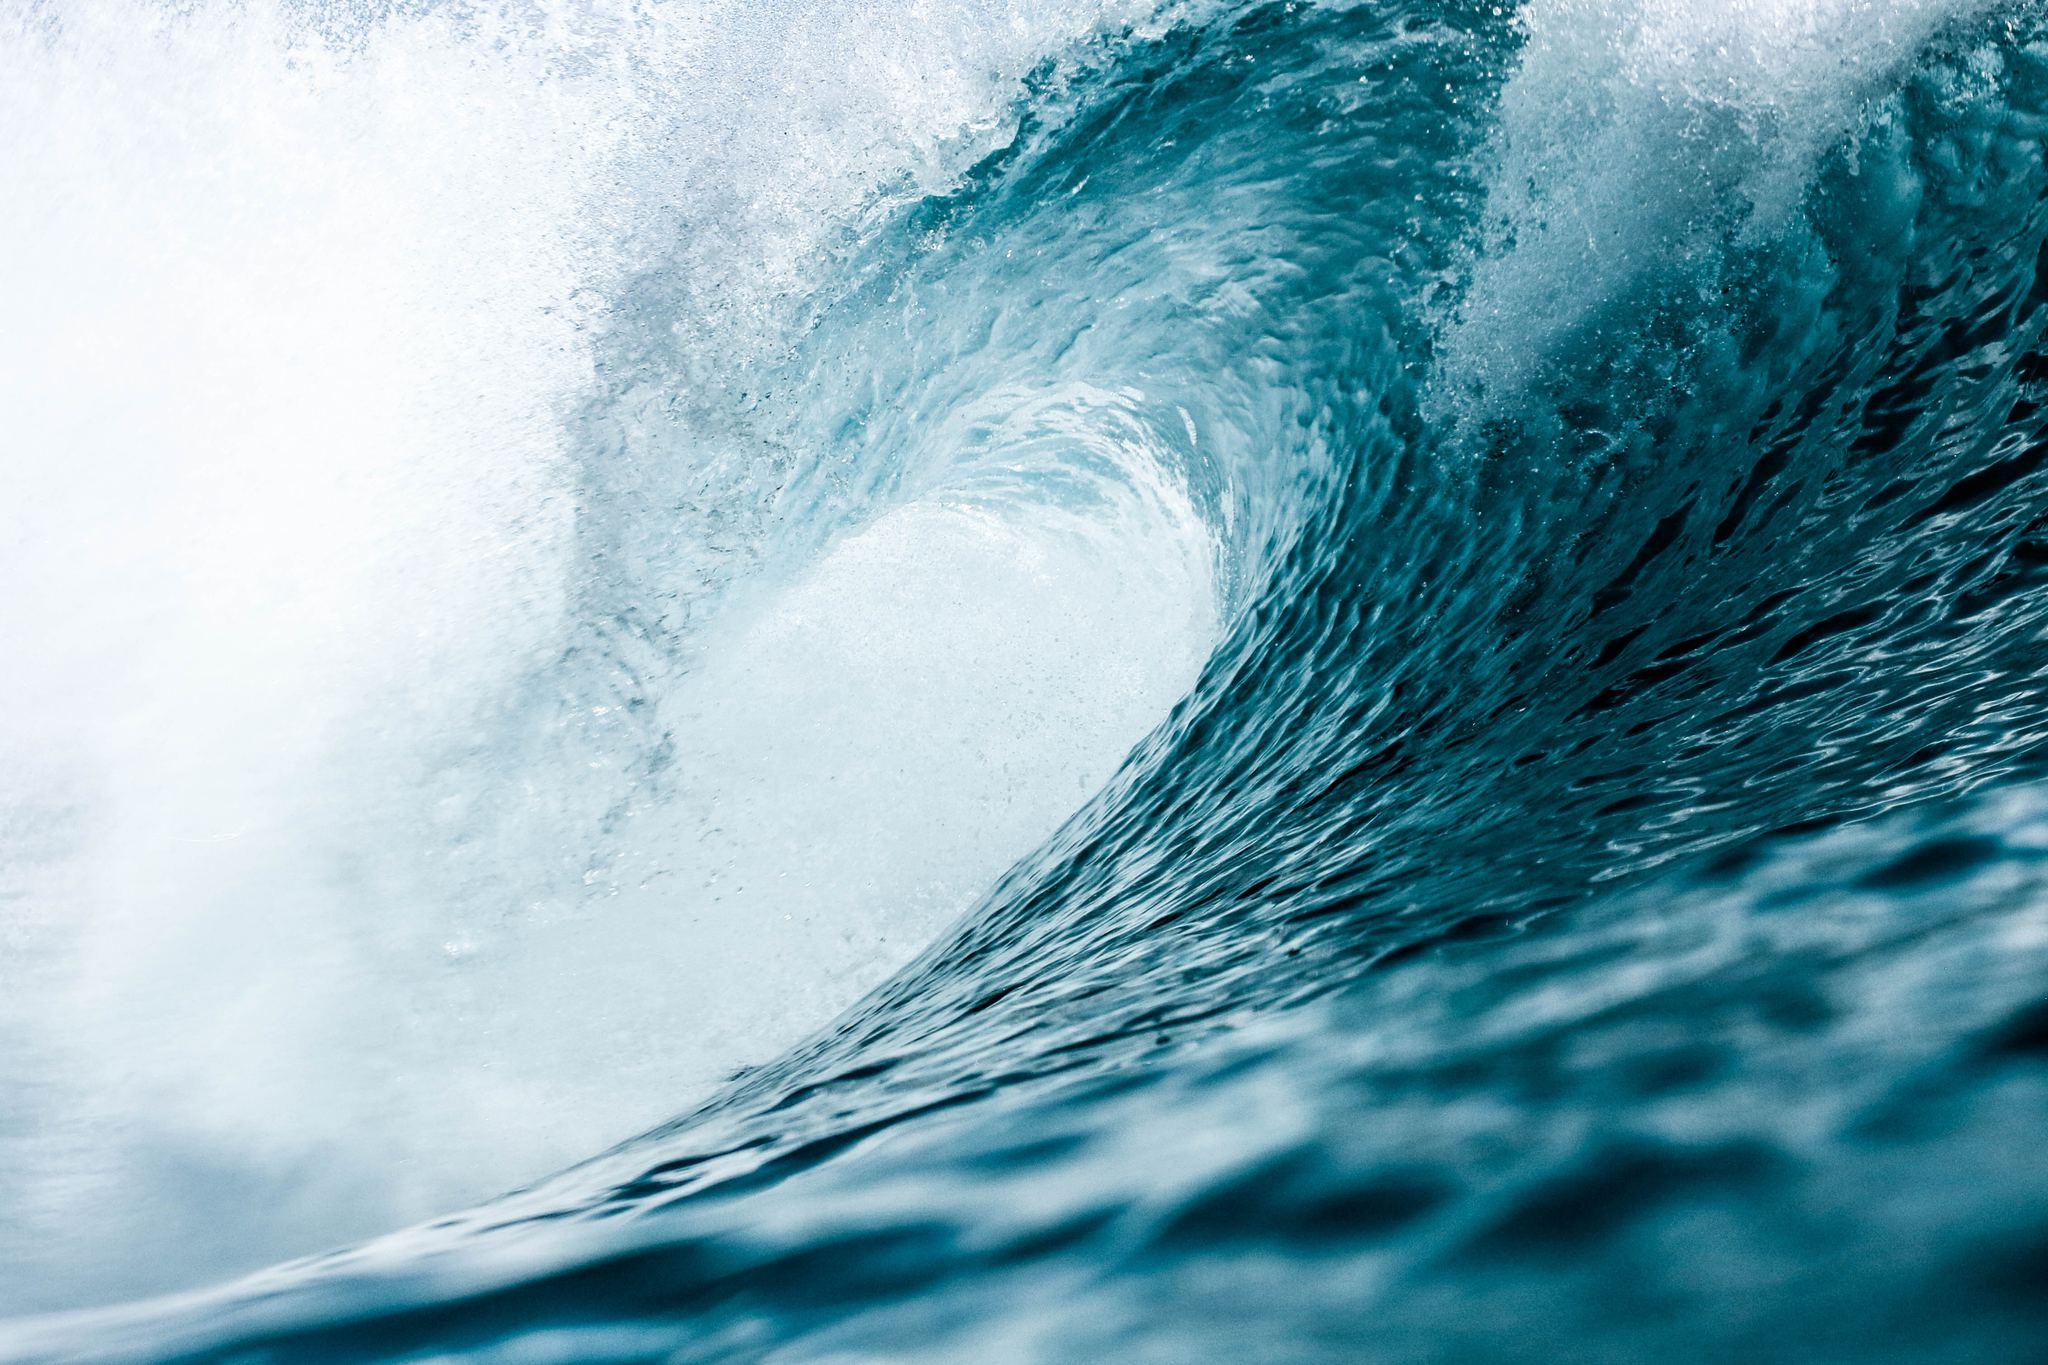 tidal wave stress dream